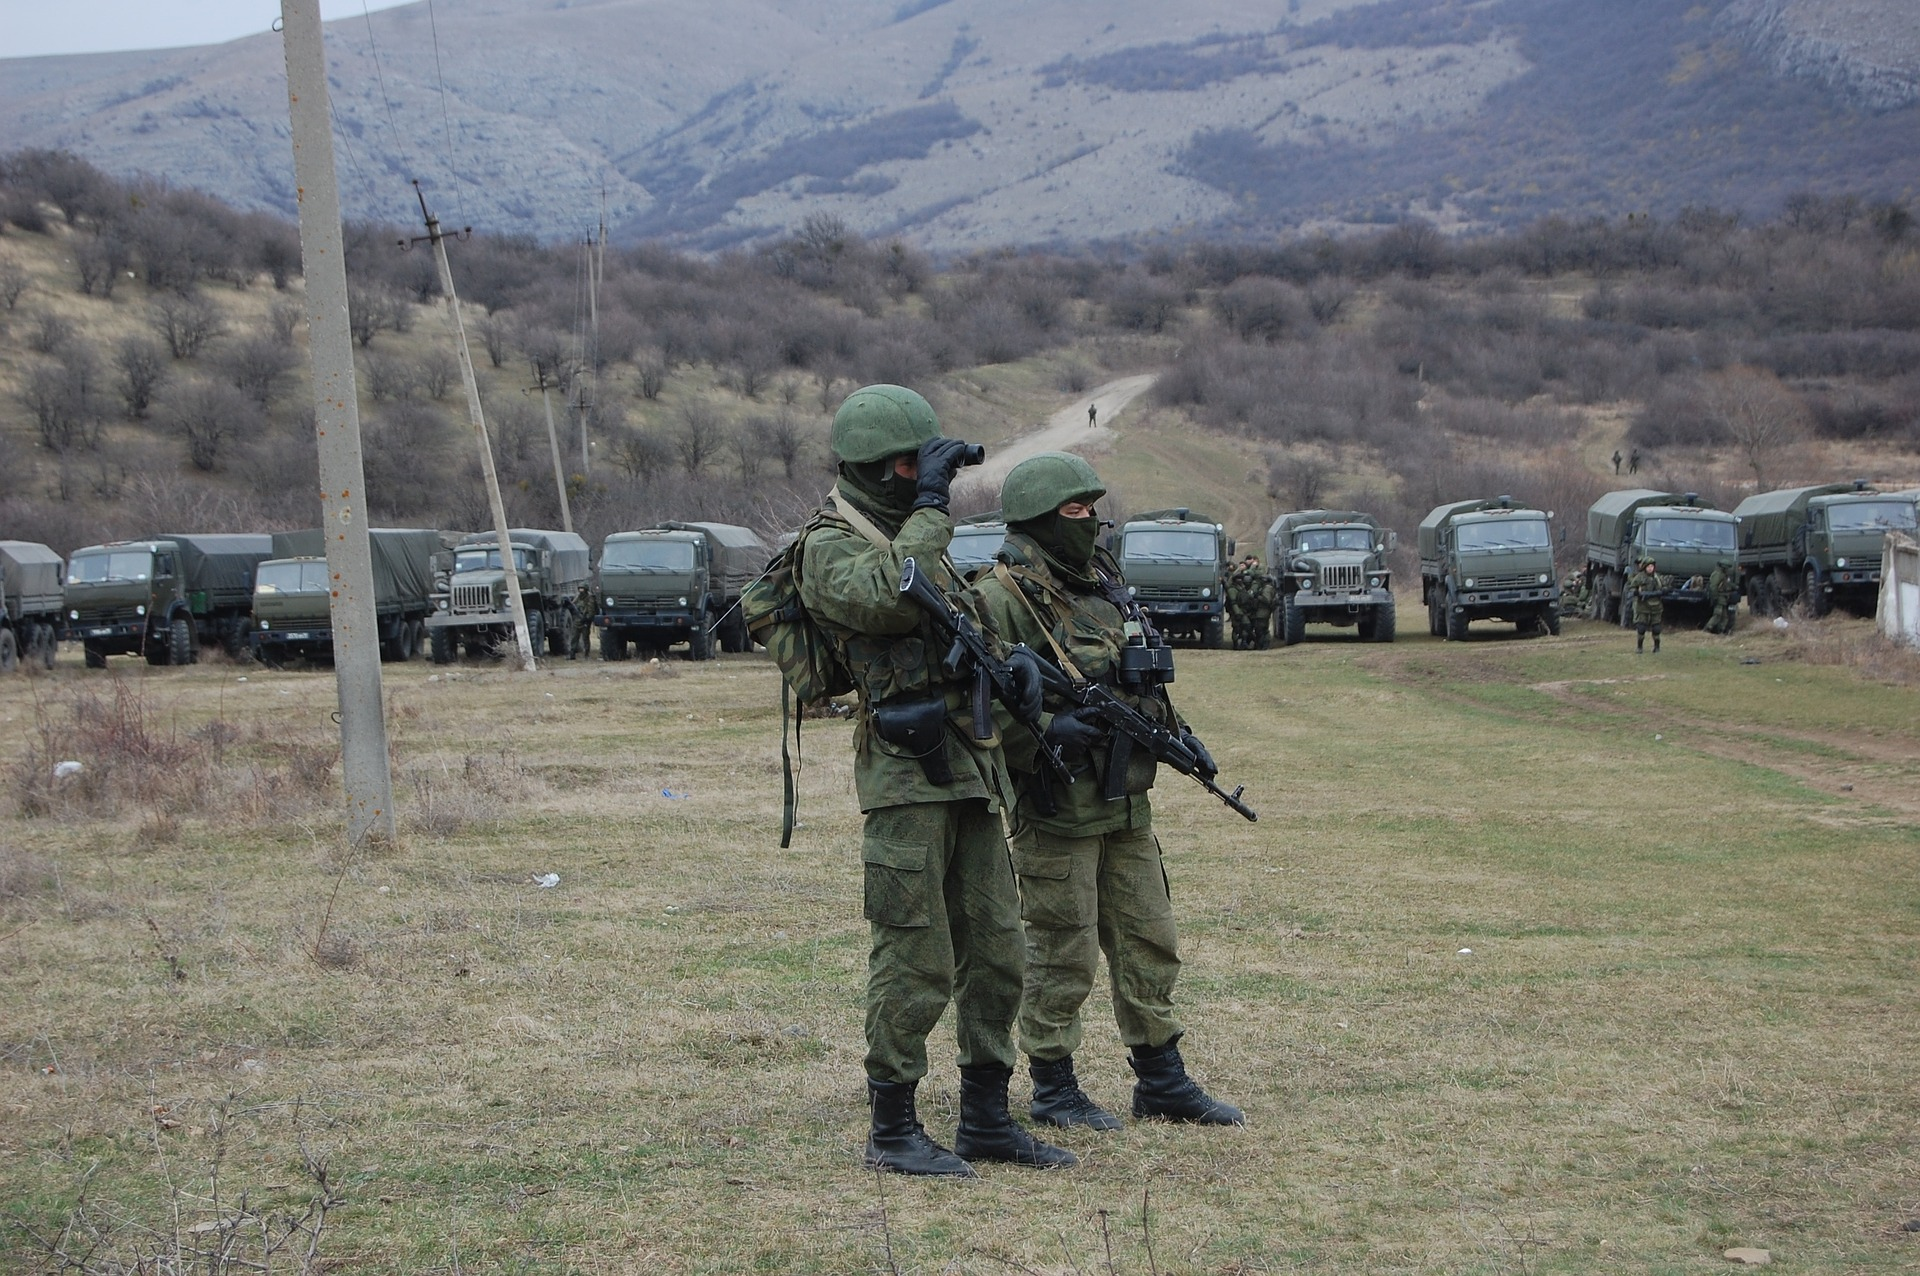 Russia annexed Crimea 7 years ago today